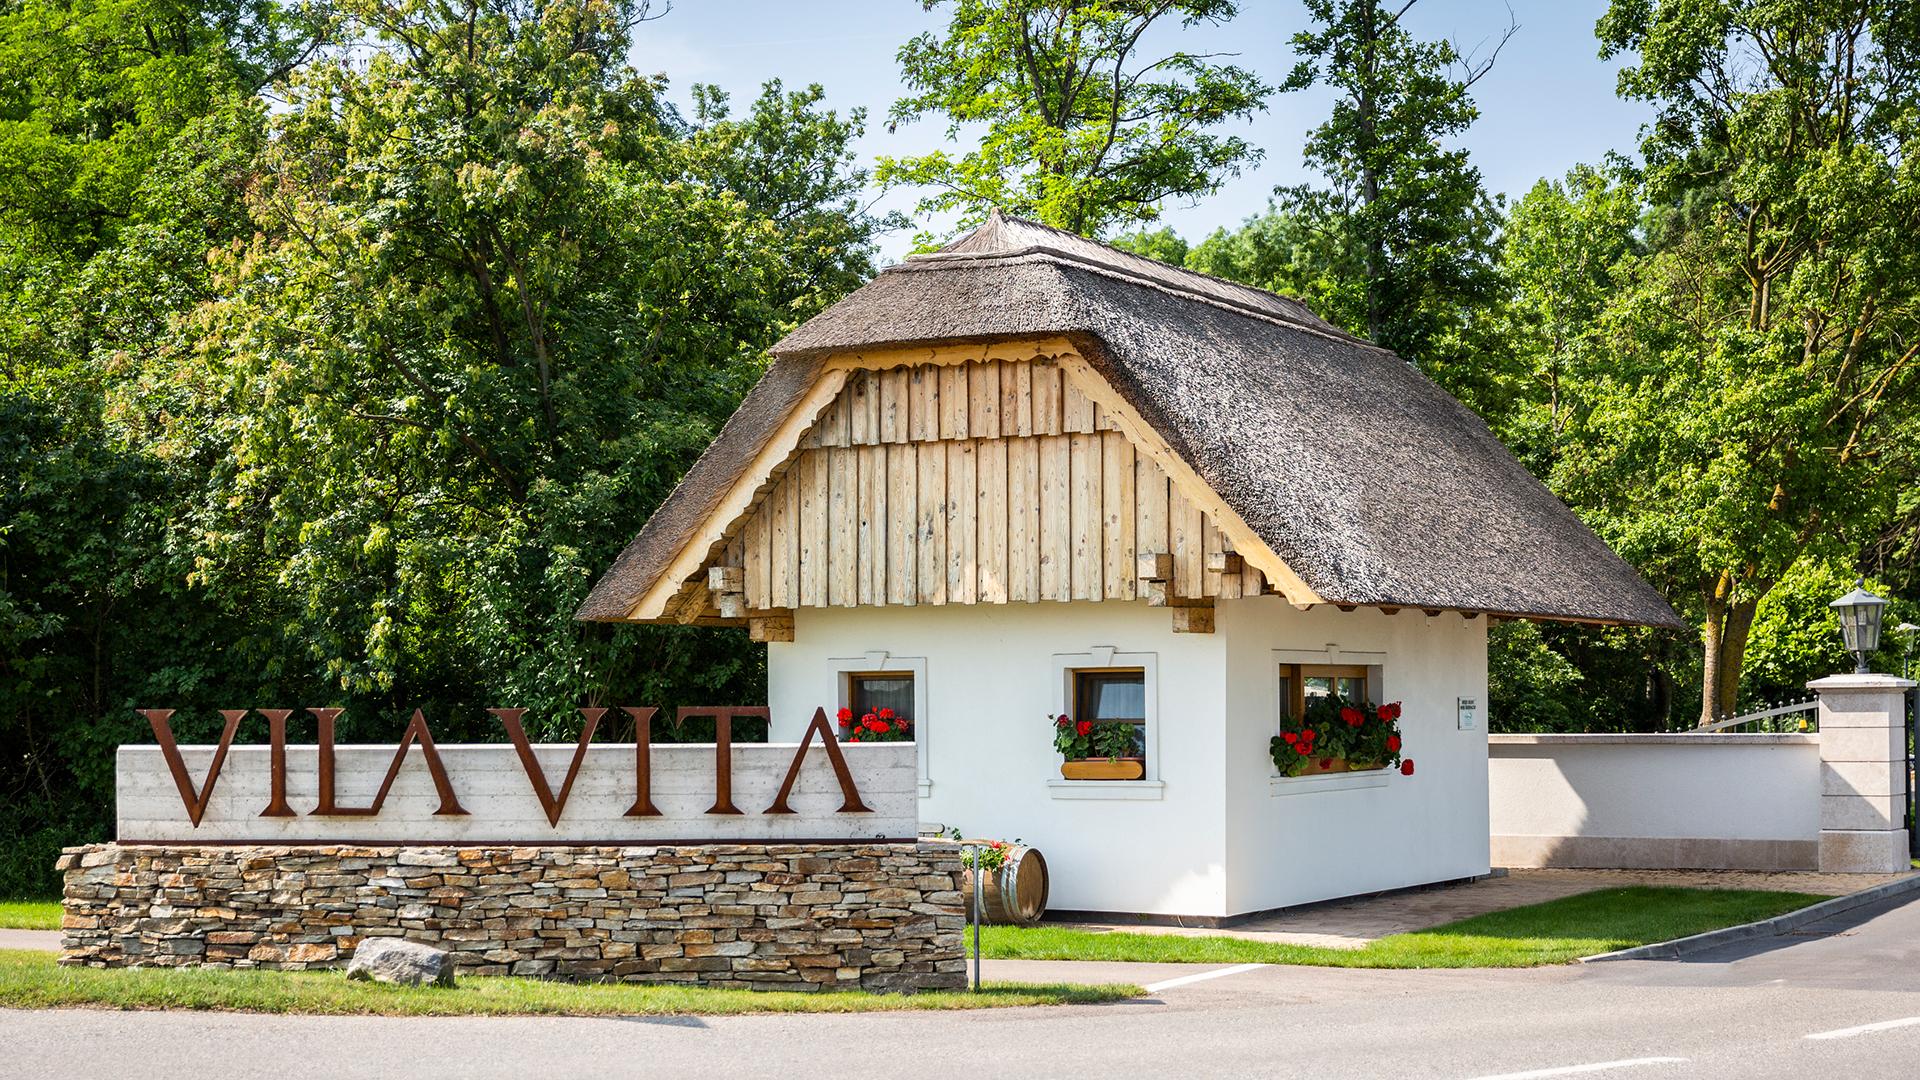 Hotel & Feriendorf VILA VITA Pannonia